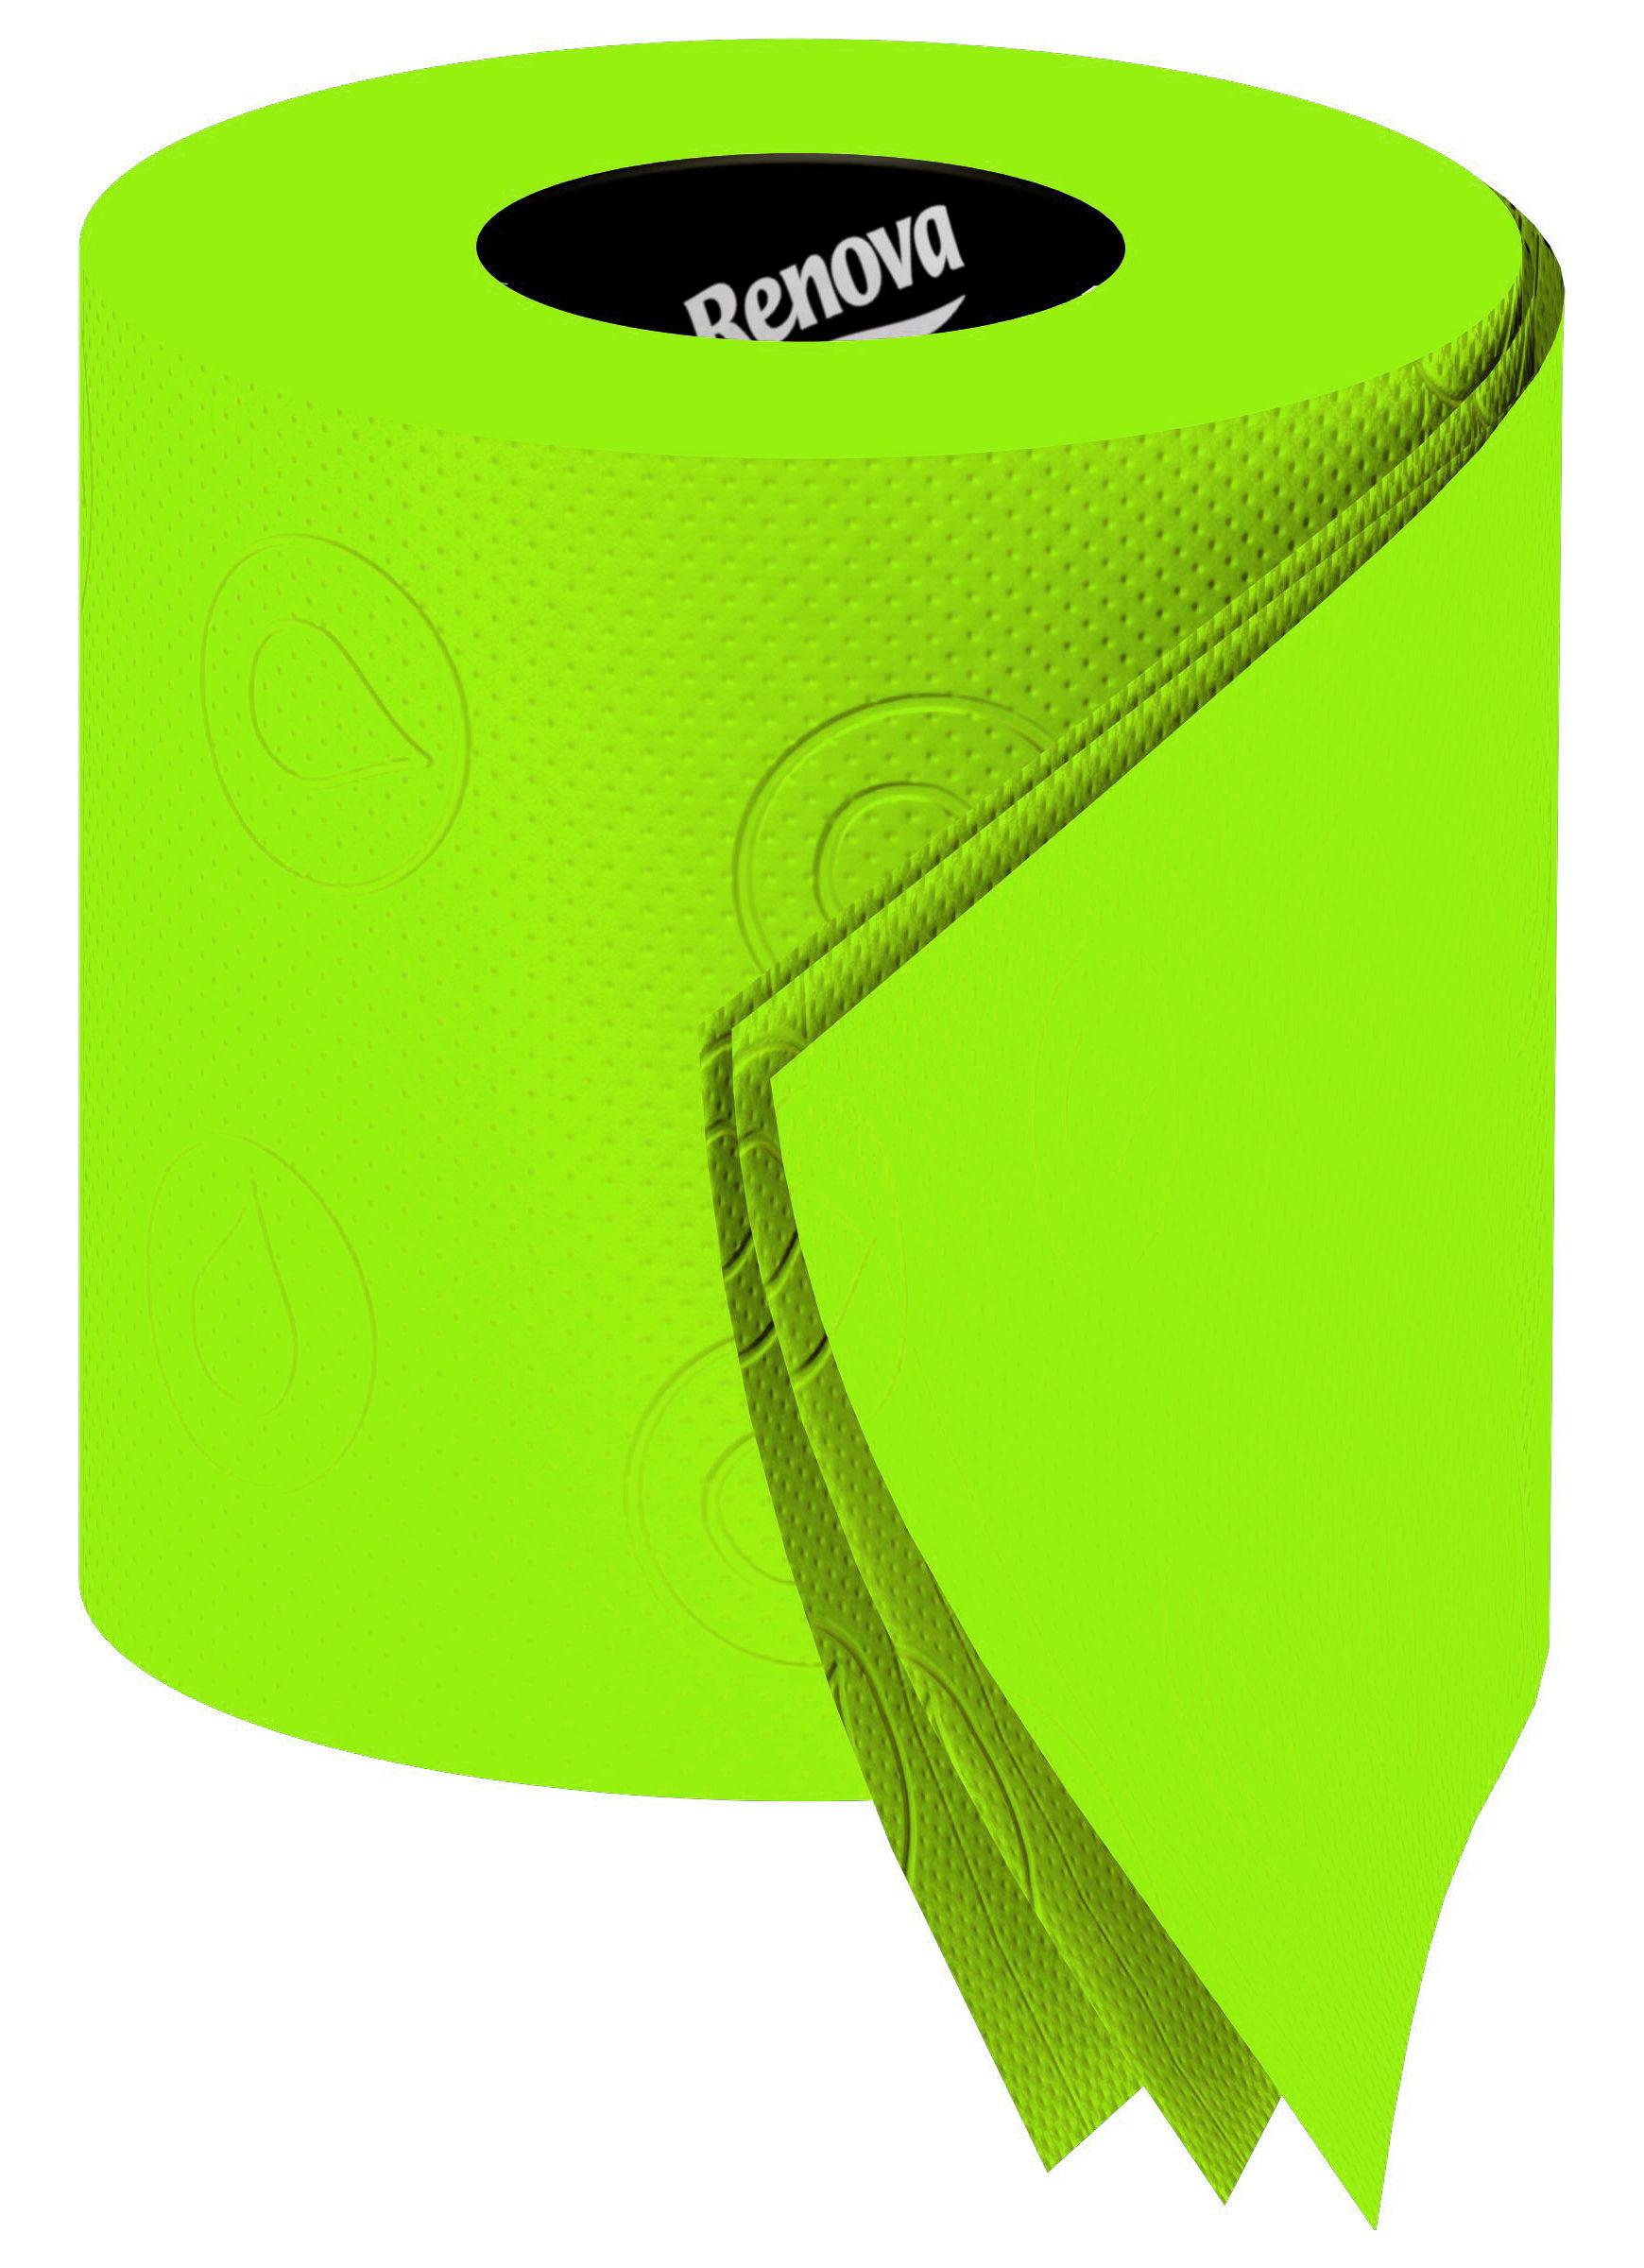 papier toilette 6 rouleaux vert 6 rouleaux renova made in design. Black Bedroom Furniture Sets. Home Design Ideas